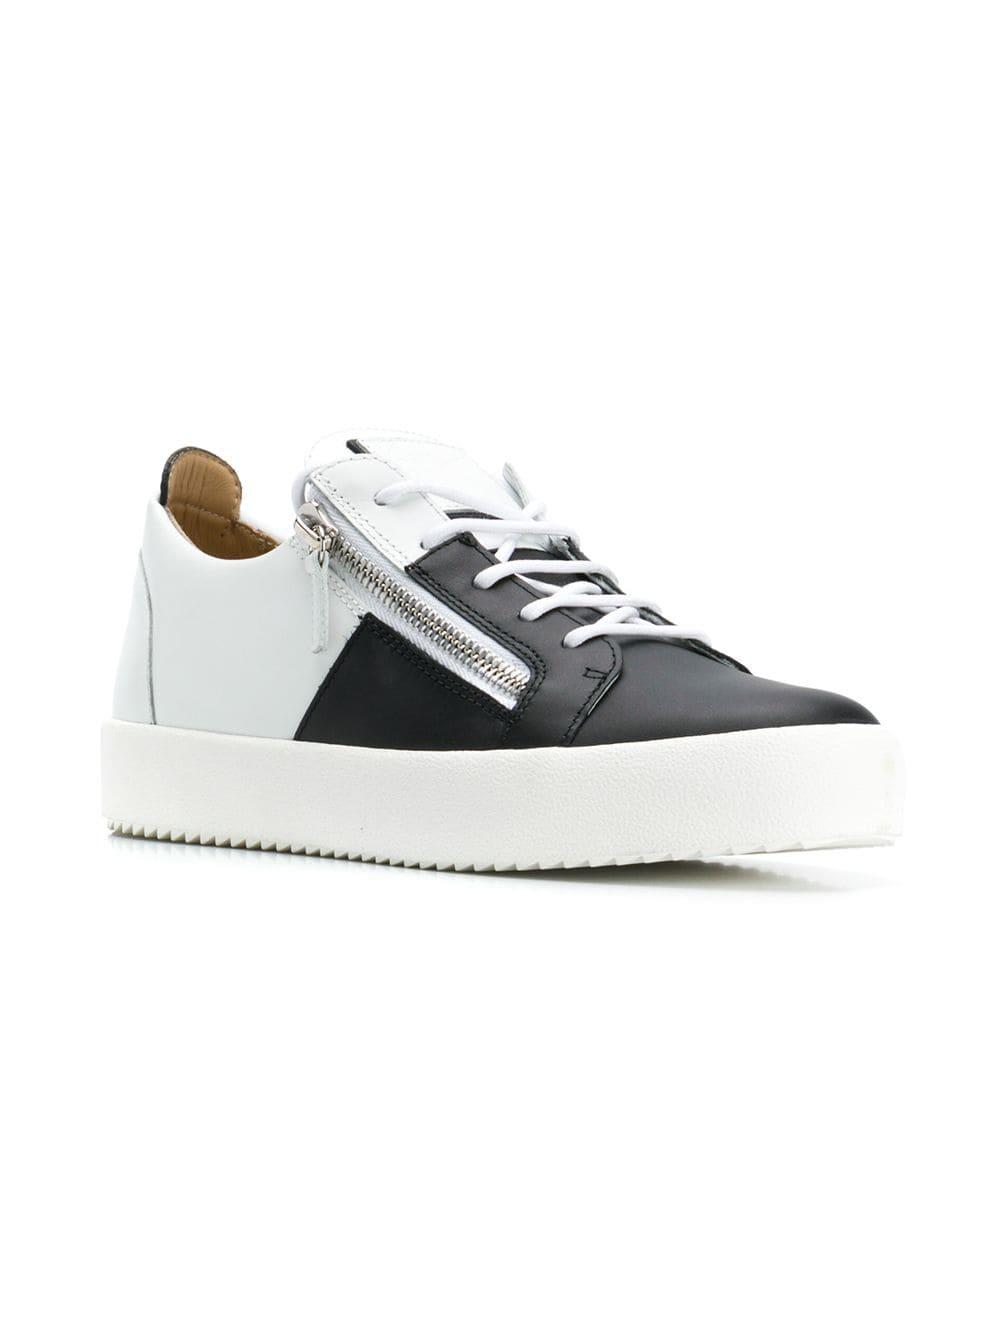 050fc5ff68d3d Lyst - Giuseppe Zanotti Frankie Signature Sneakers in White for Men